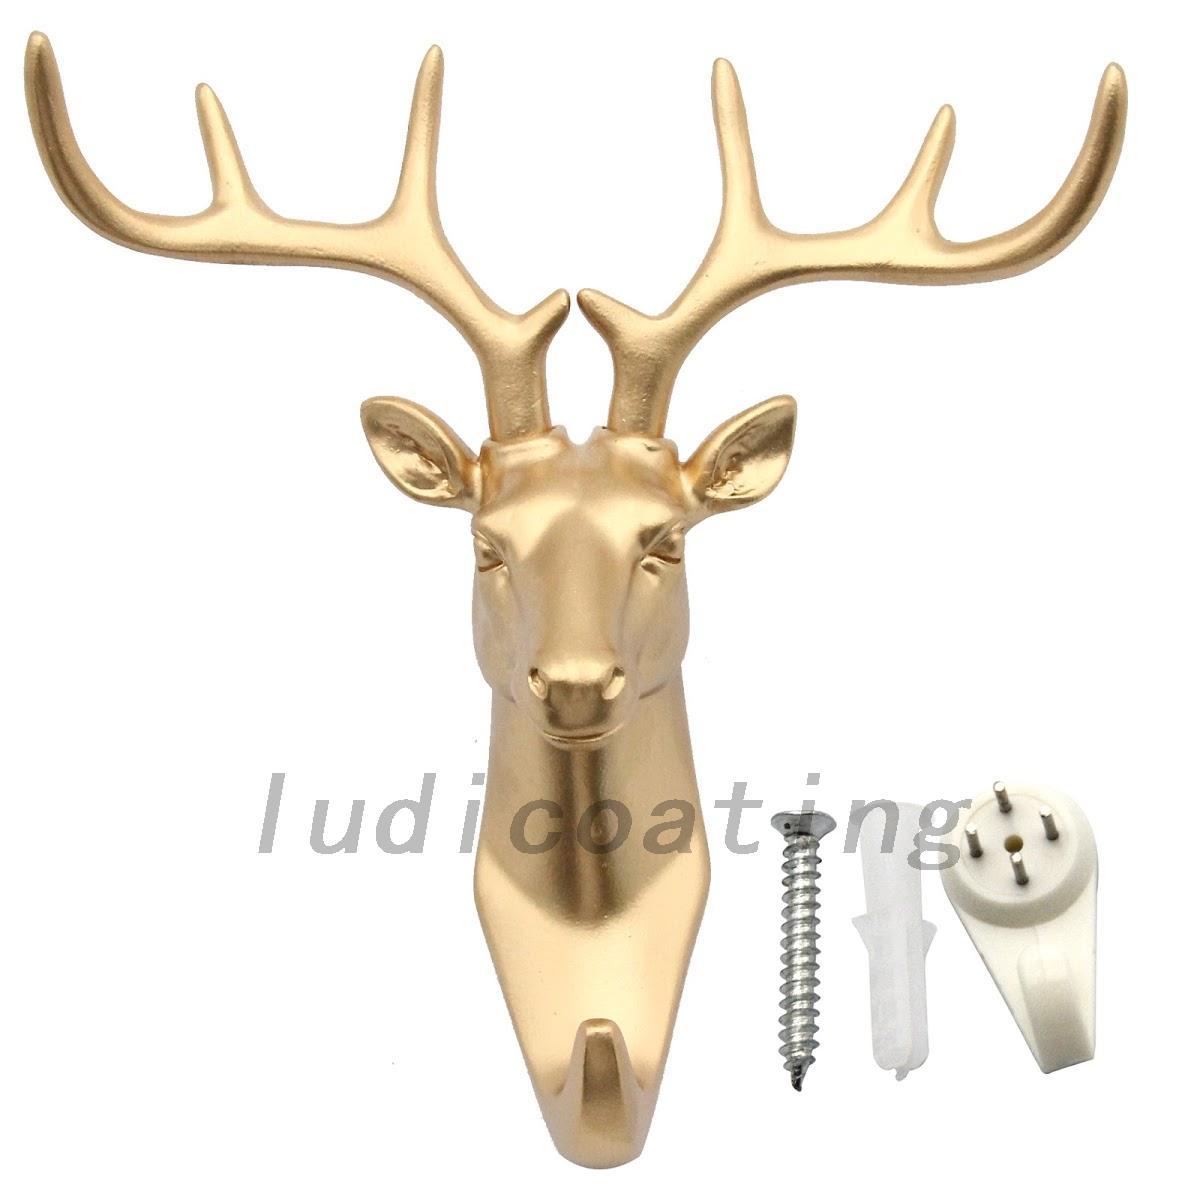 New hot animal deer stags head hook wall hanger rack holder resin home decor ebay - Decorative stags head ...